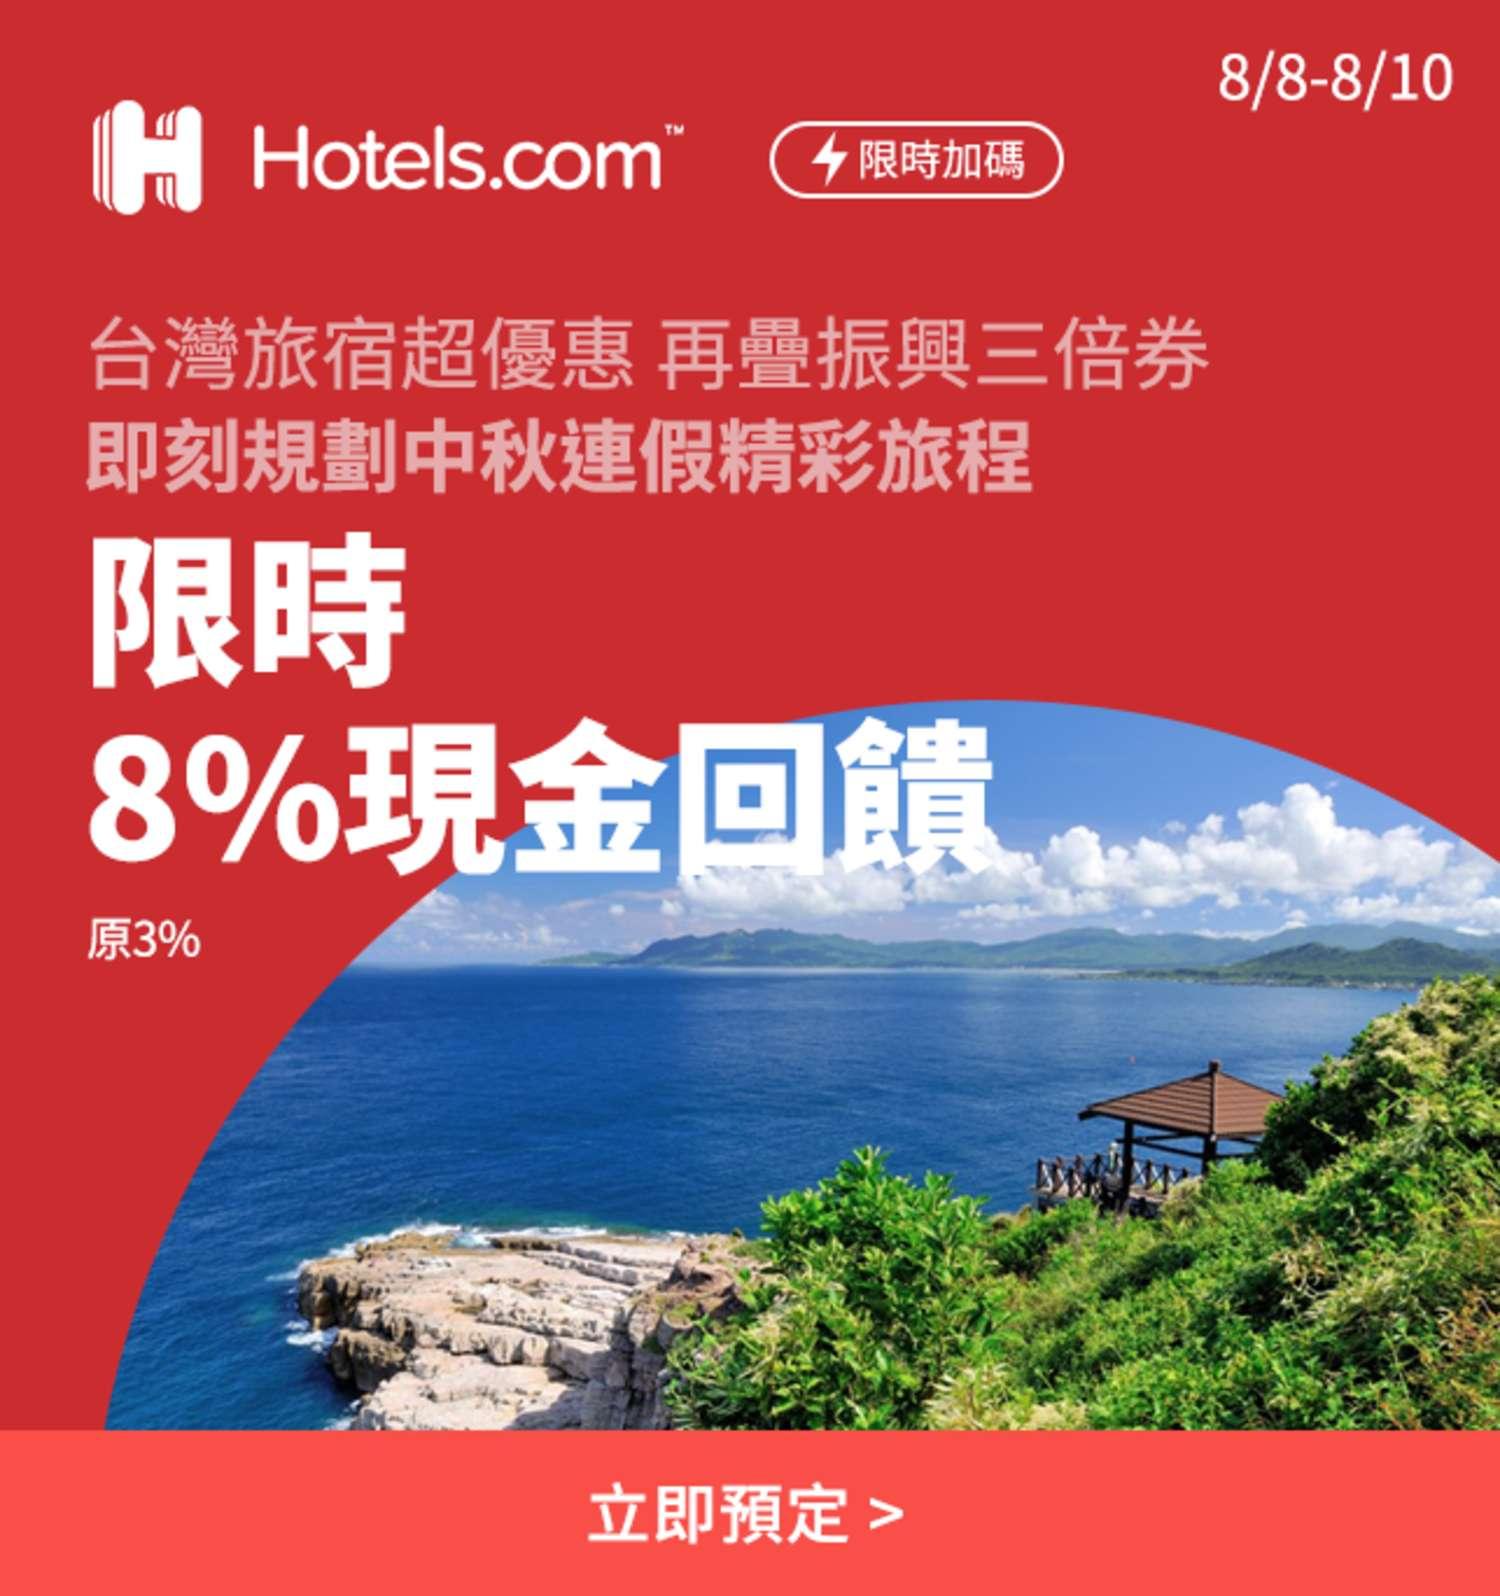 Hotels.com 8/8-8/10